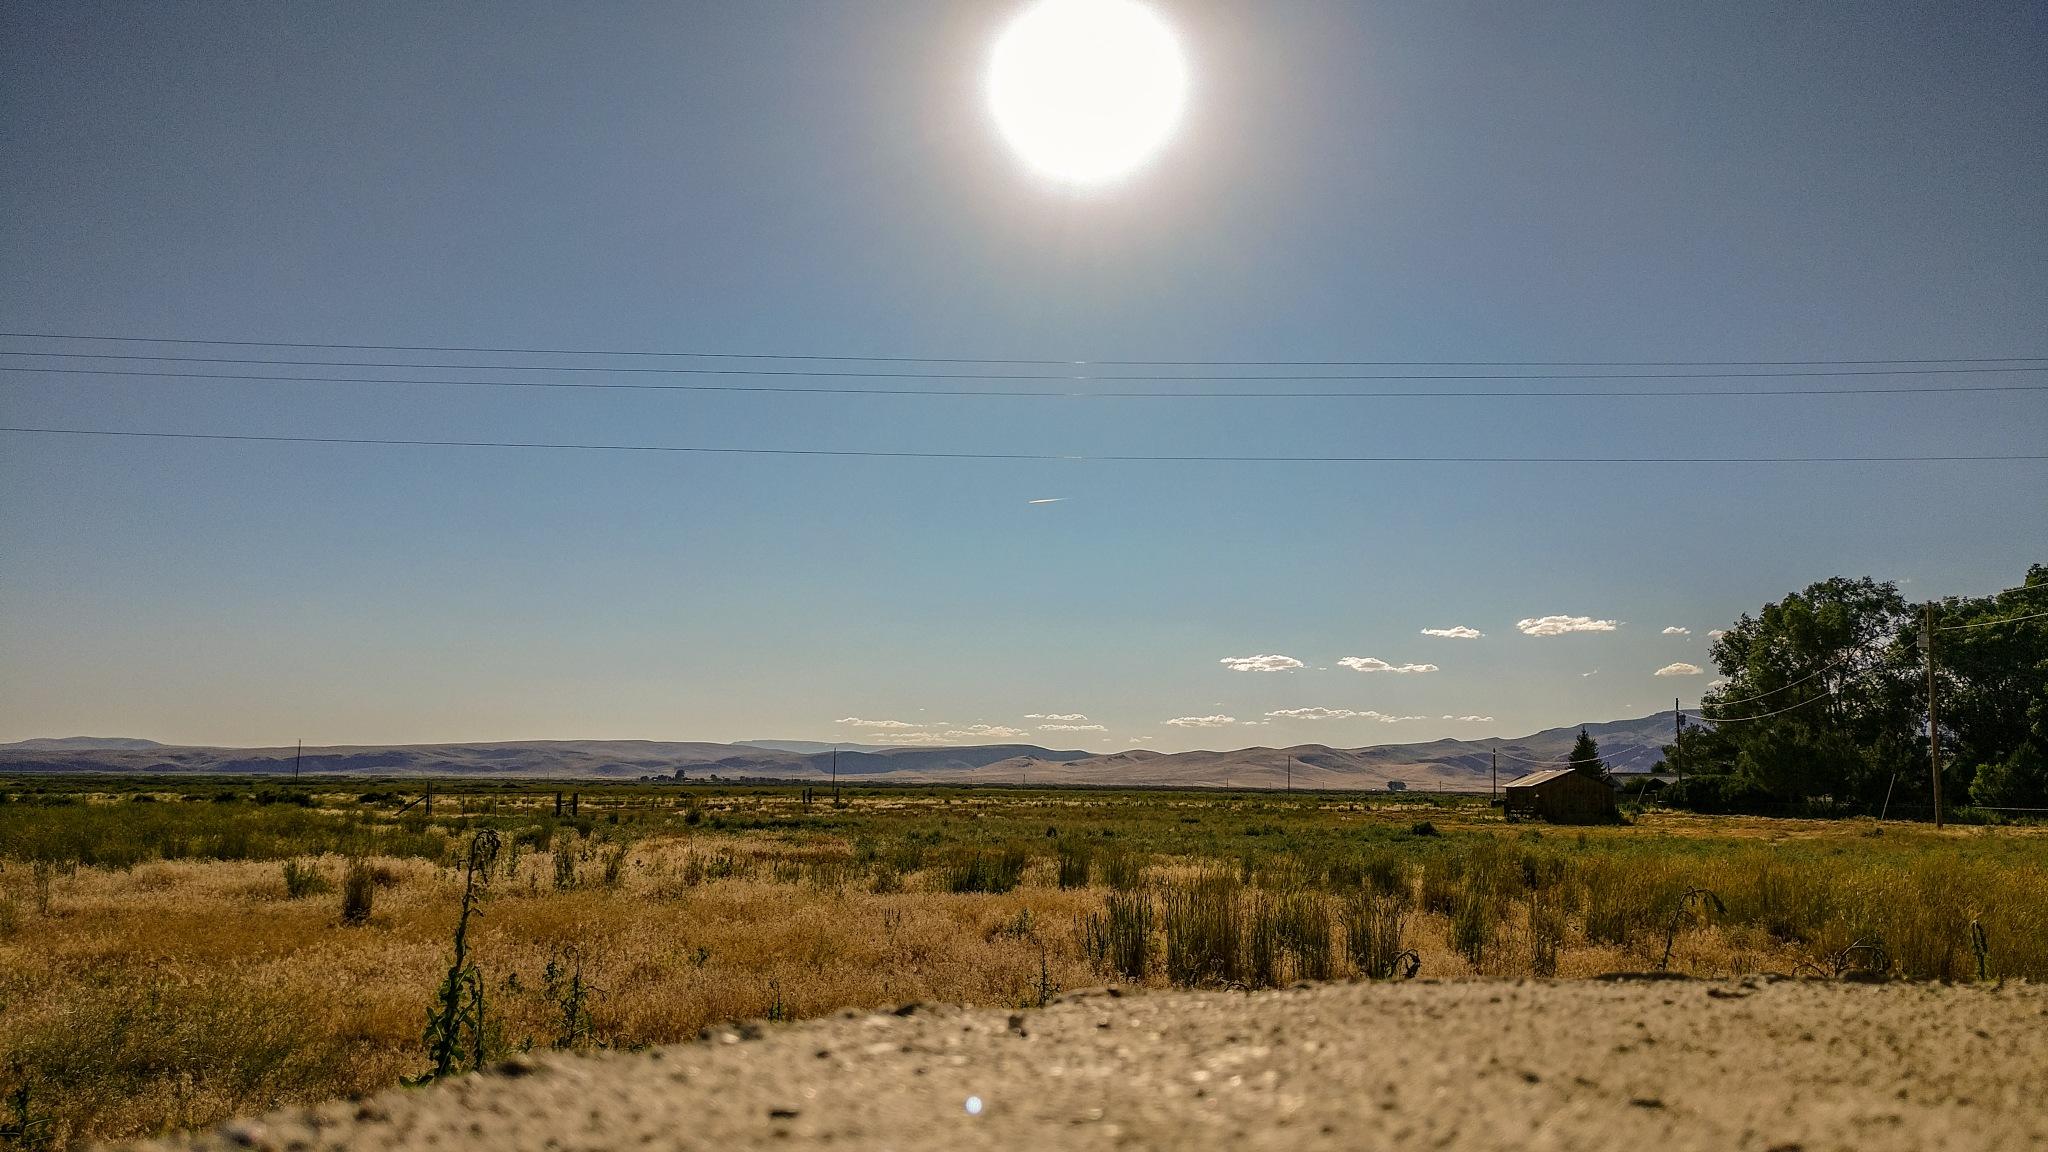 McDermitt, Nevada by Orion Cochran